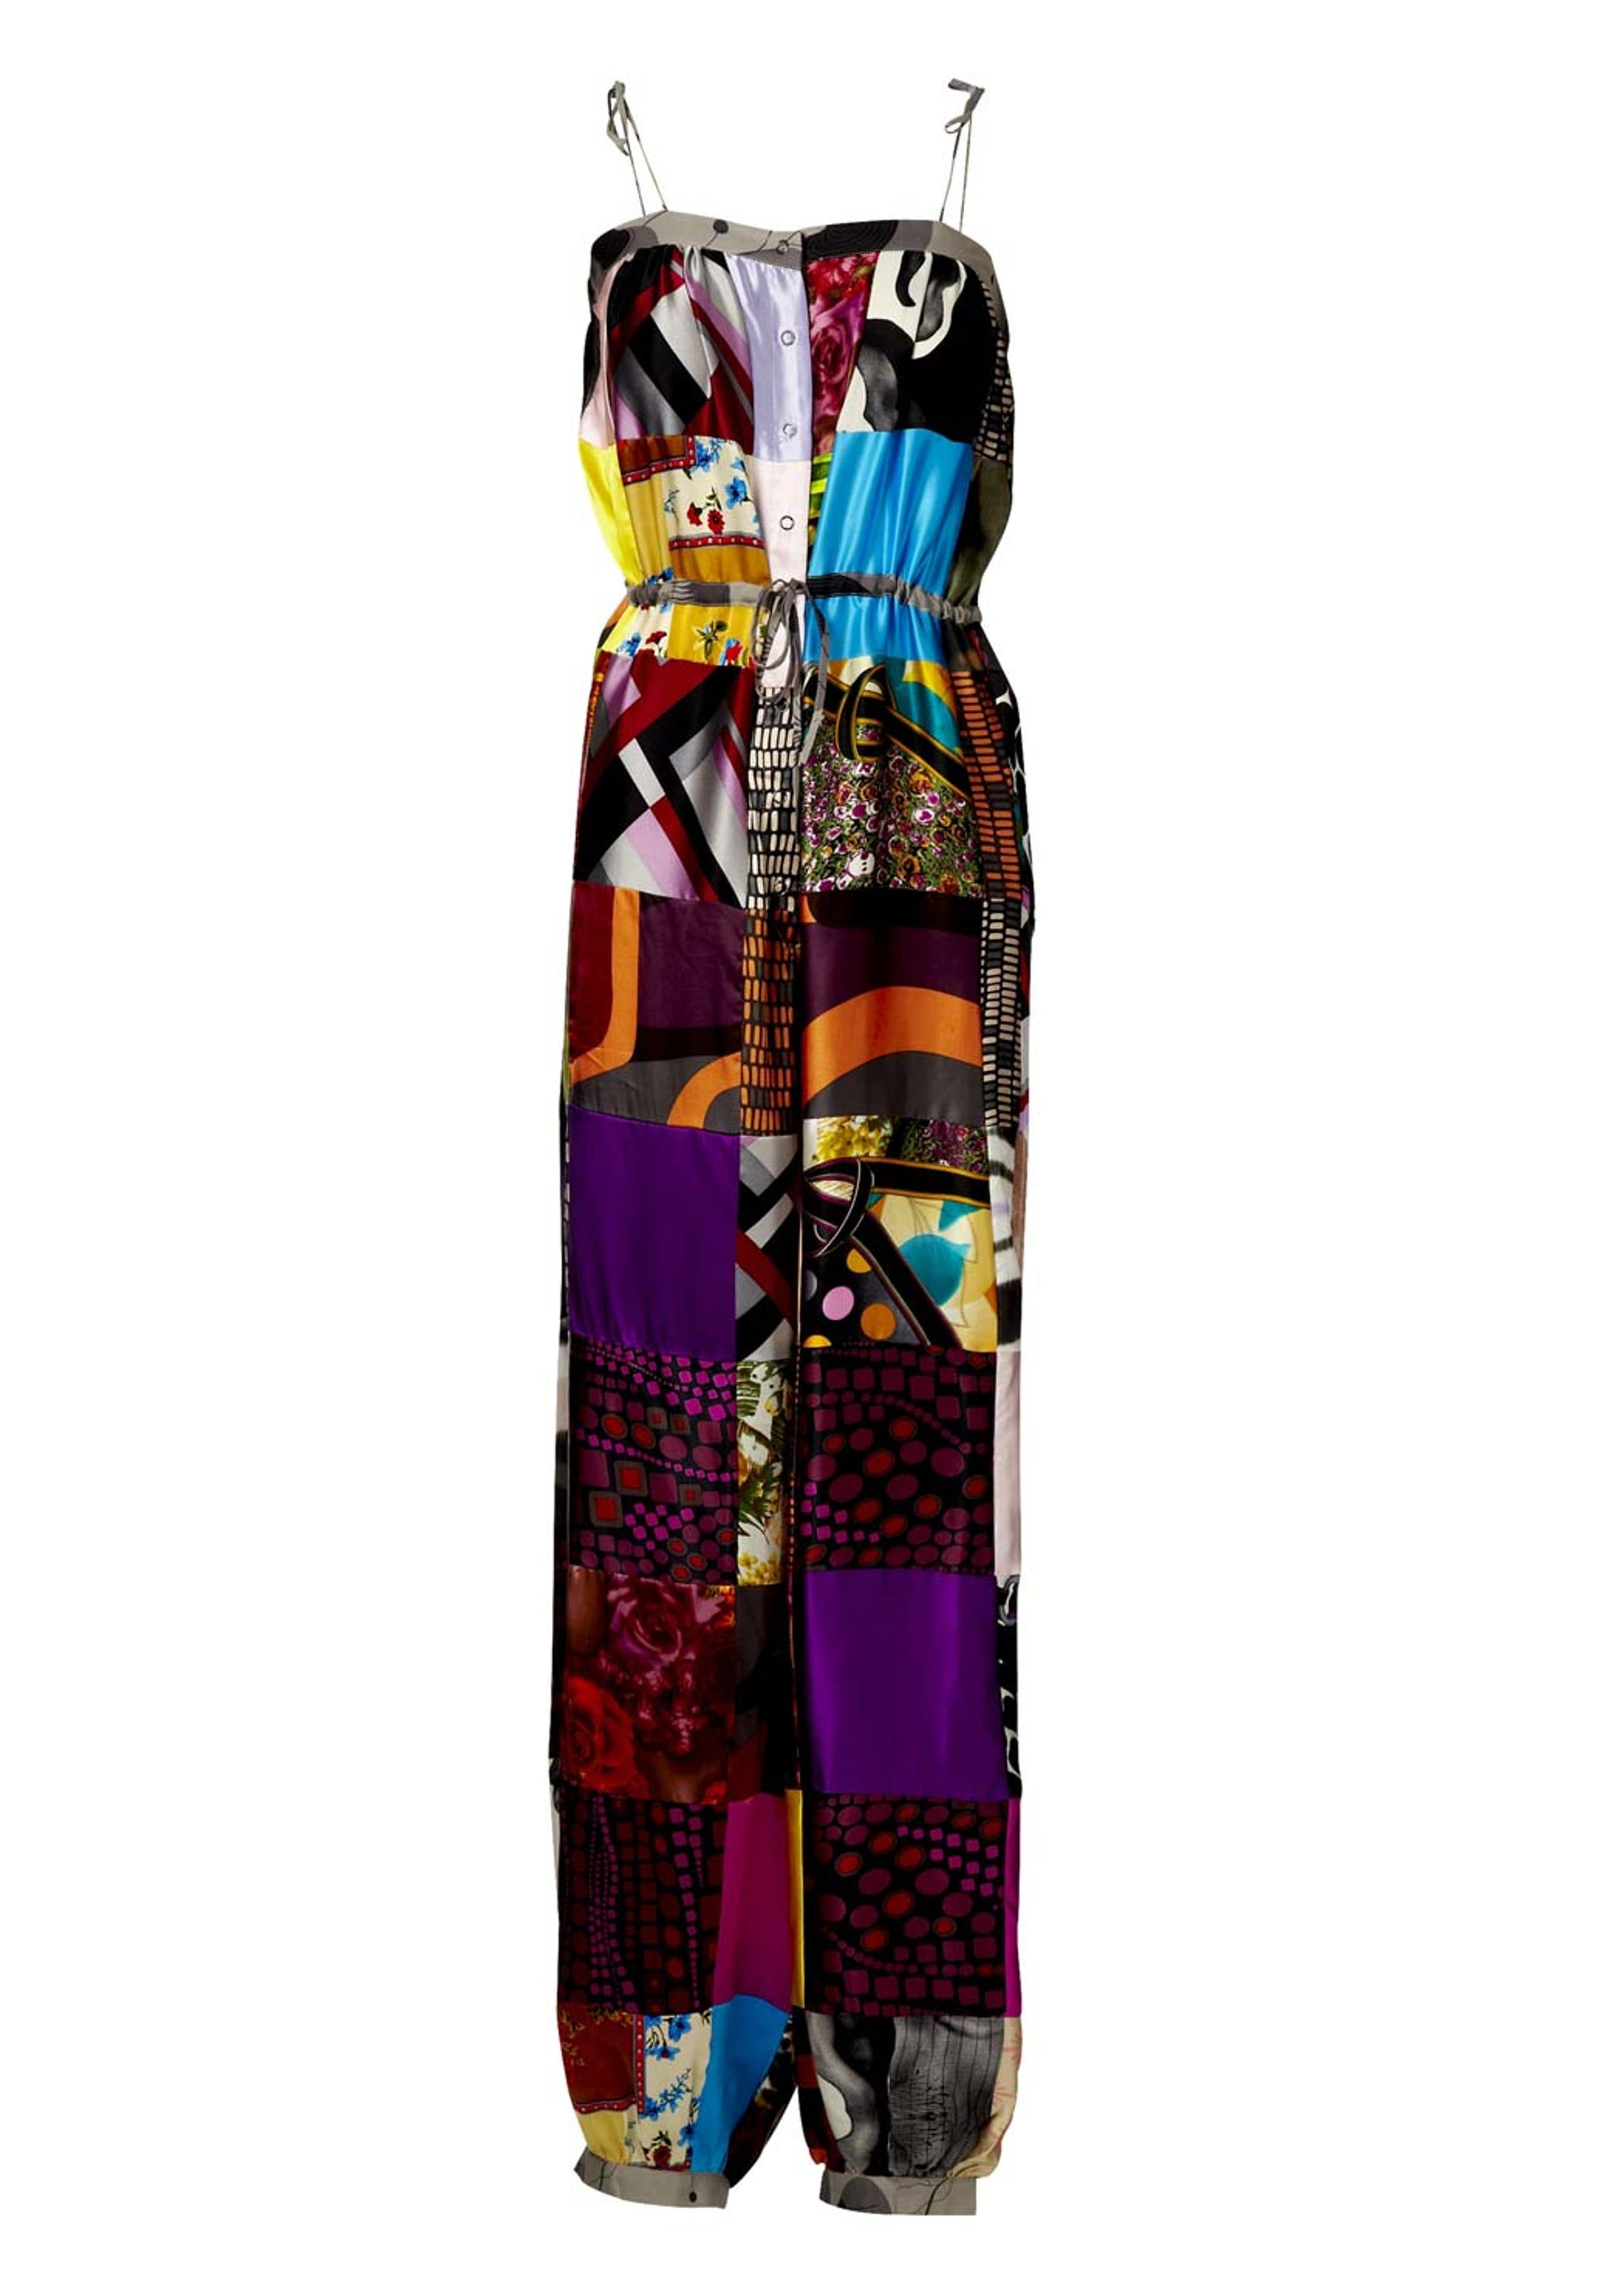 925f78663b97 Handla kläder och mode från 15X15 online: Karen, Karen, Korinne ...